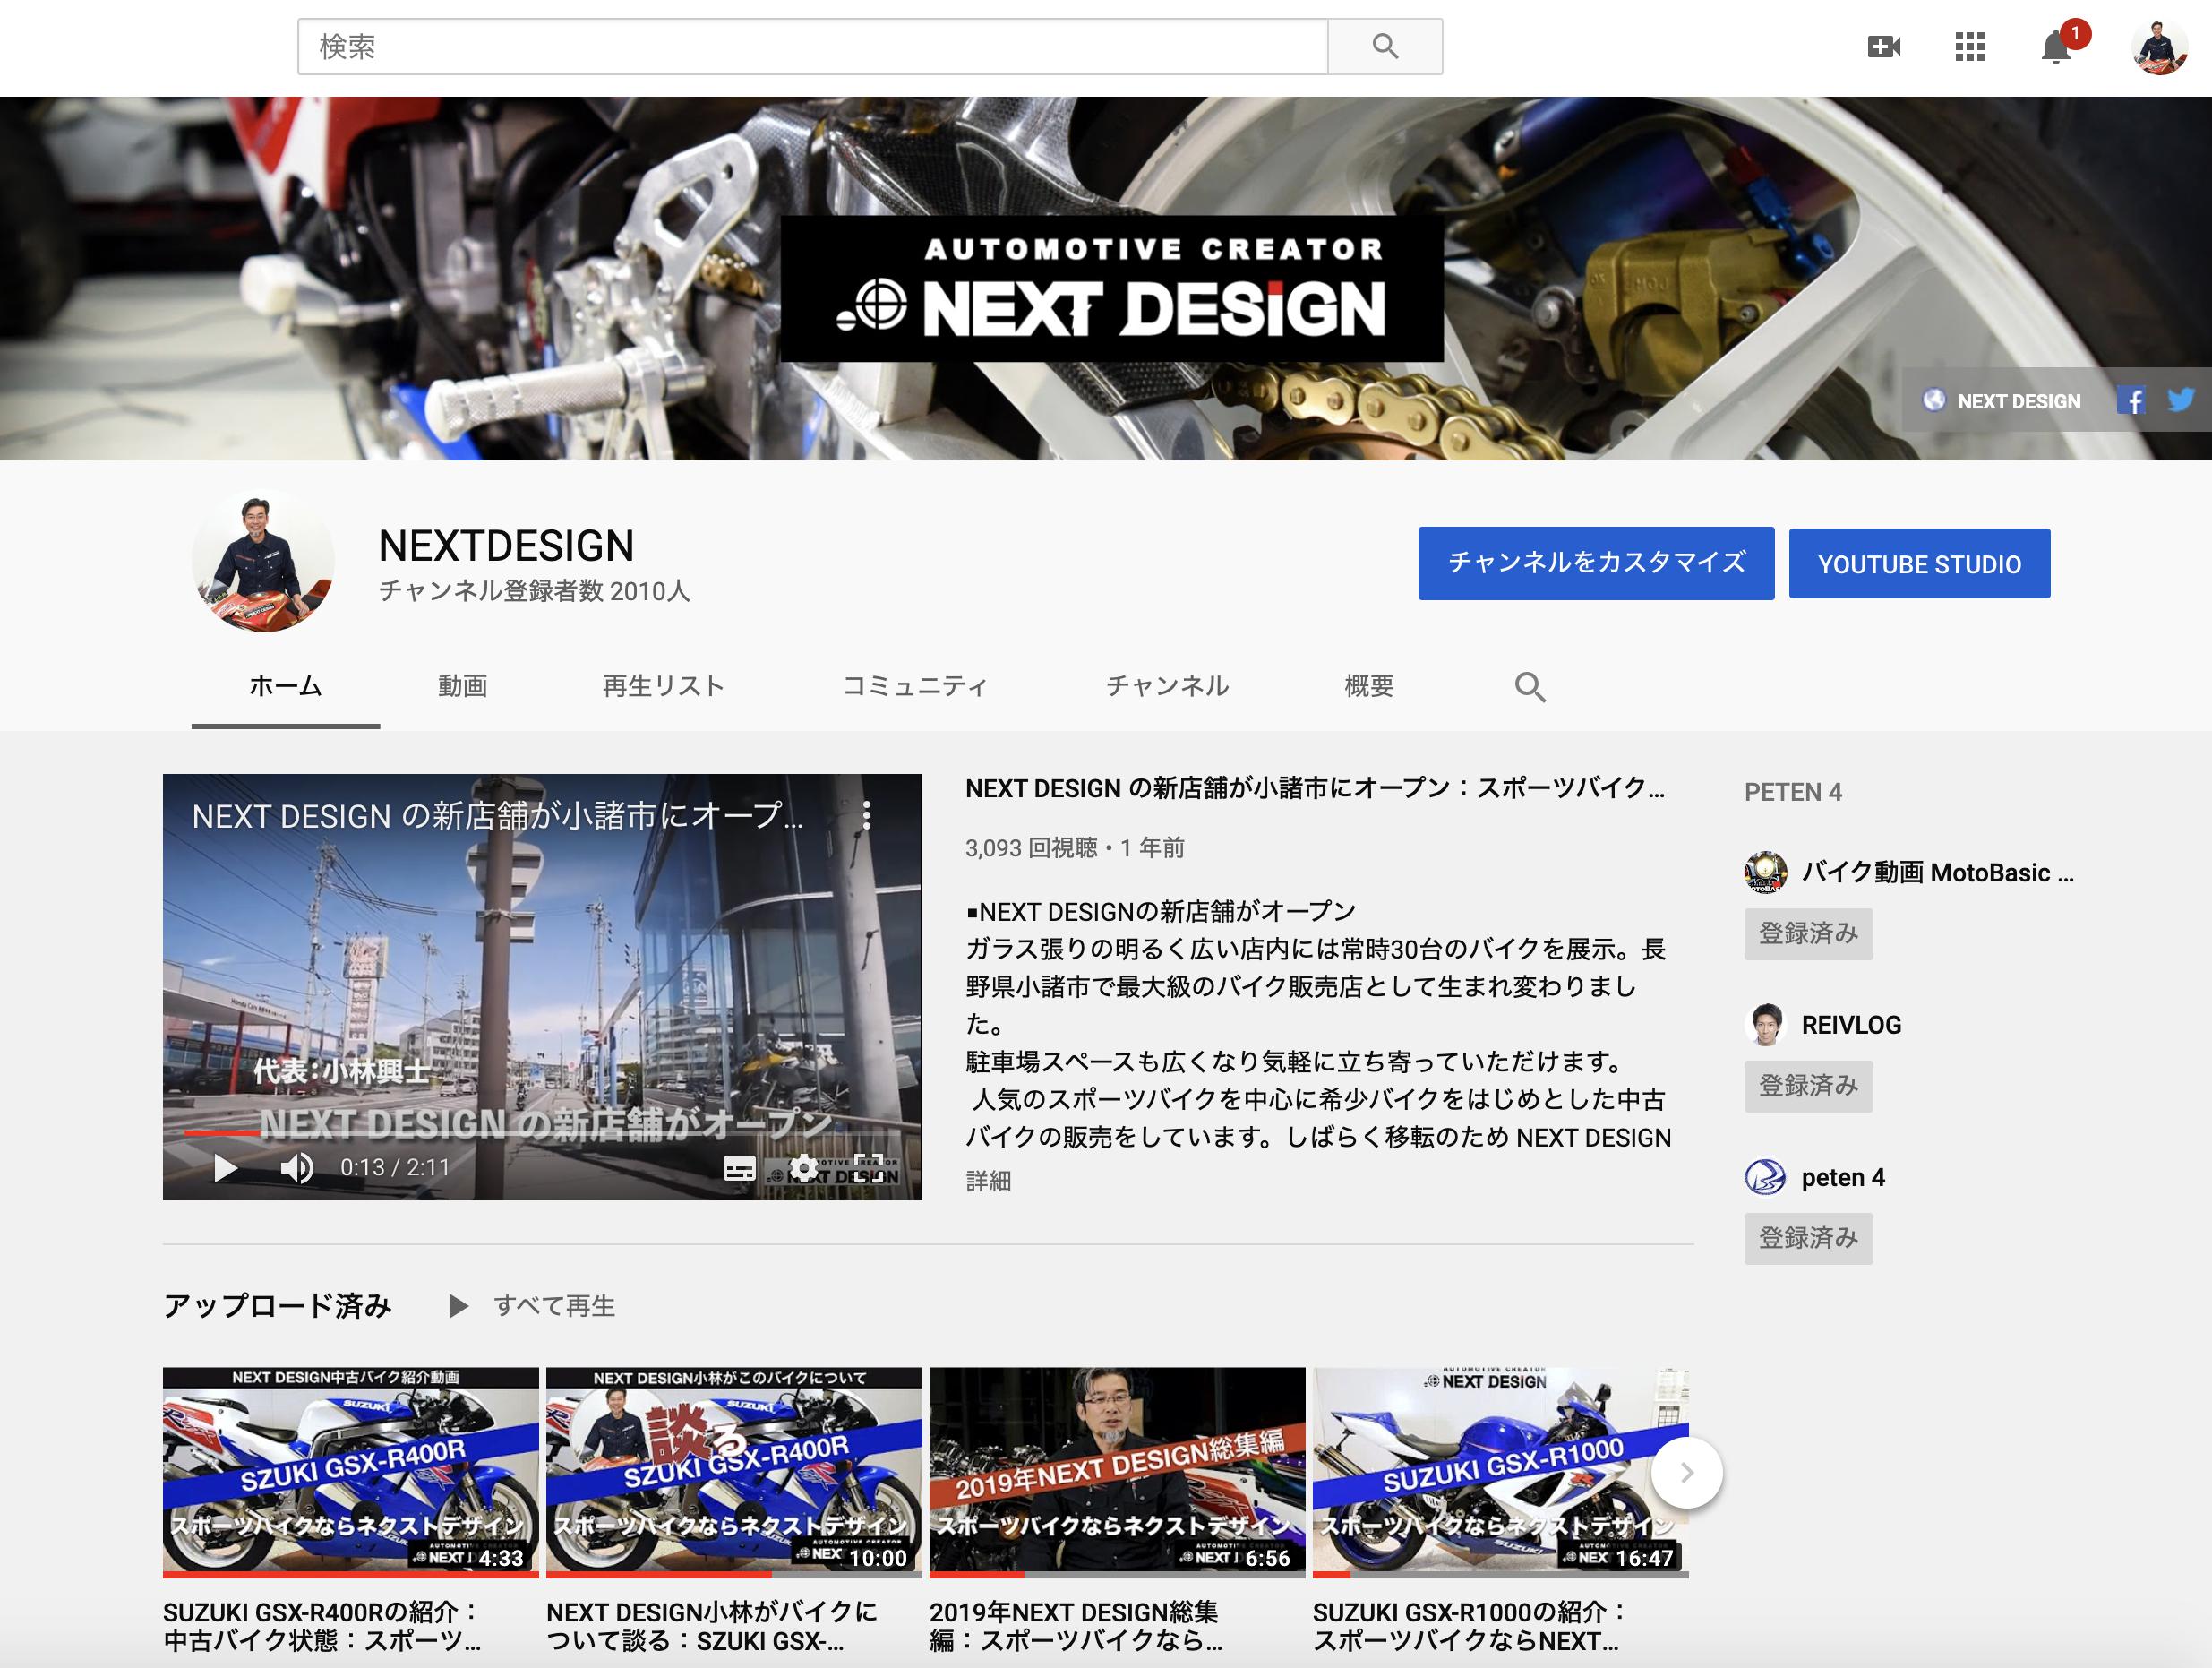 NEXT DESIGN YouTubeチャンネル